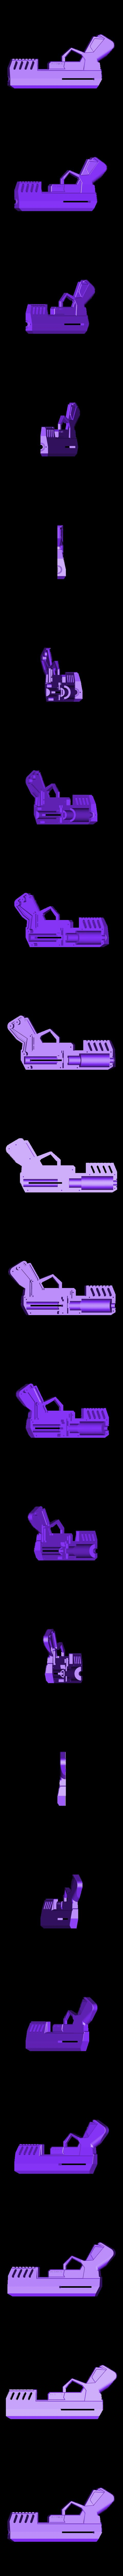 shell2.stl Download free STL file Foam Dart GUN (pullback loading) • 3D print design, senns